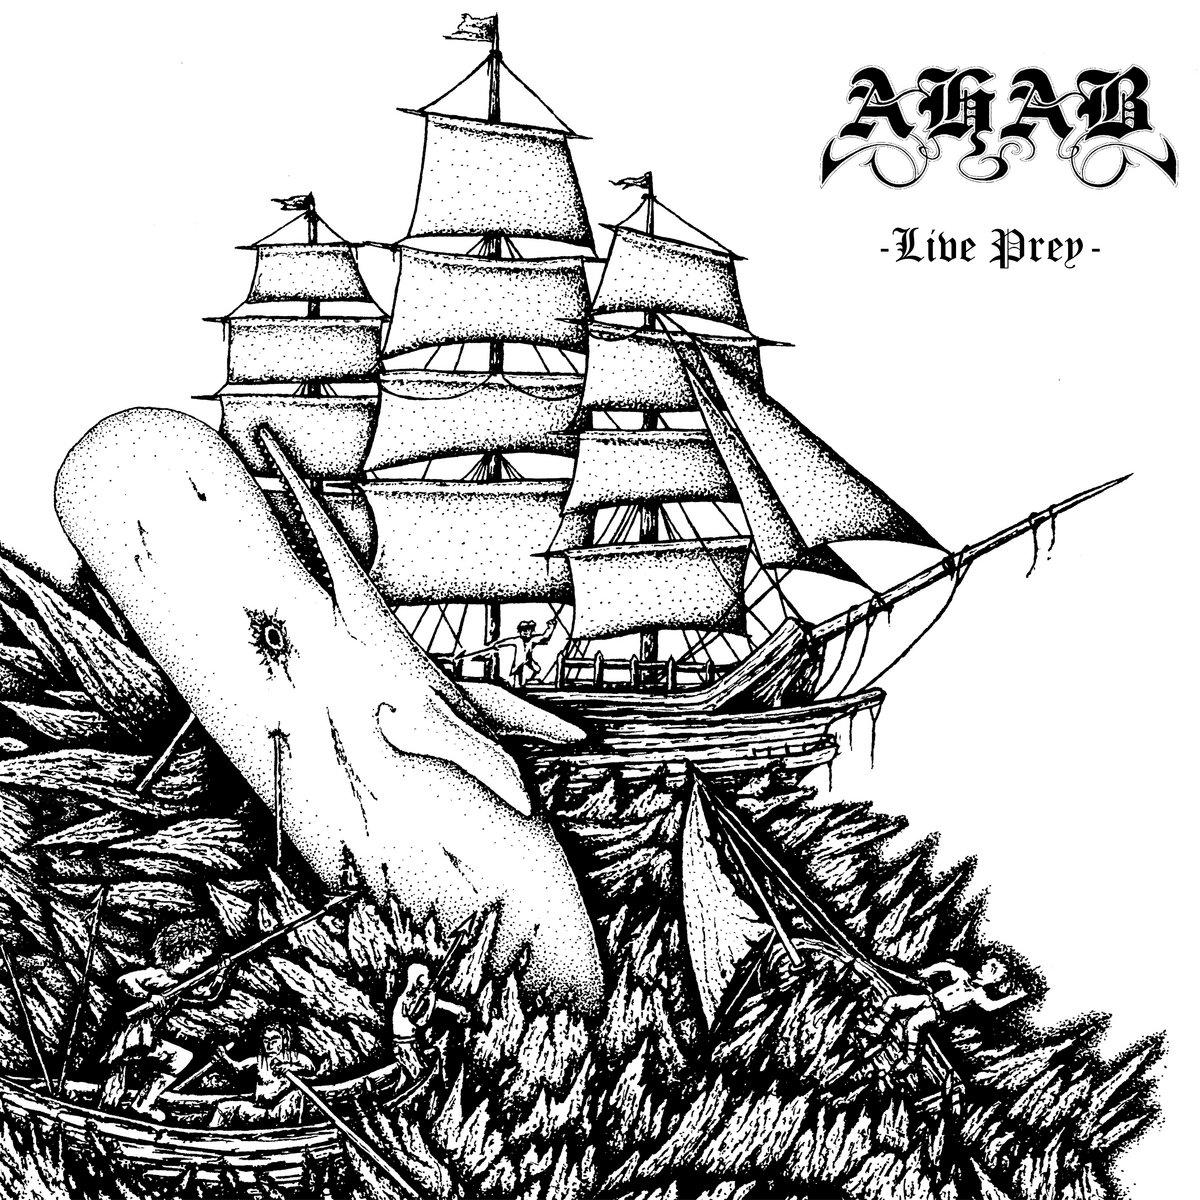 ahab live prey